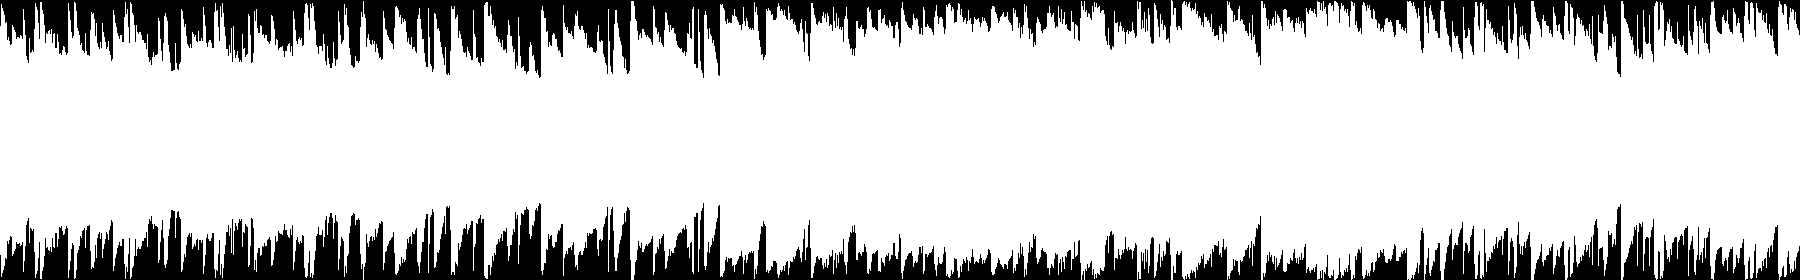 Dissolve - Lofi Trap audio waveform